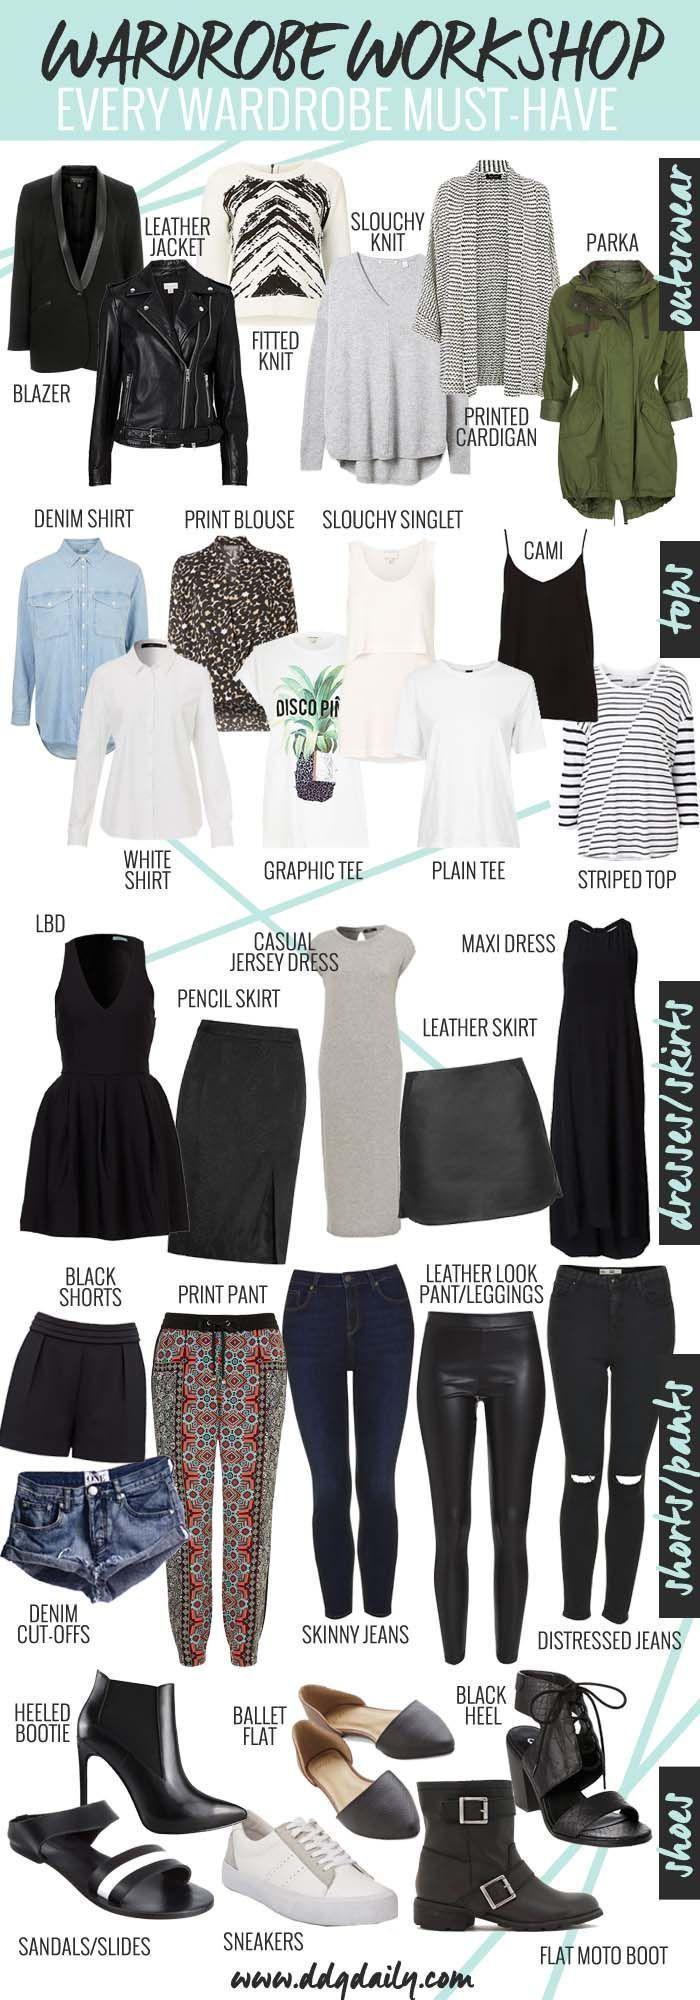 The street style fashion essentials on www.ddgdaily.com